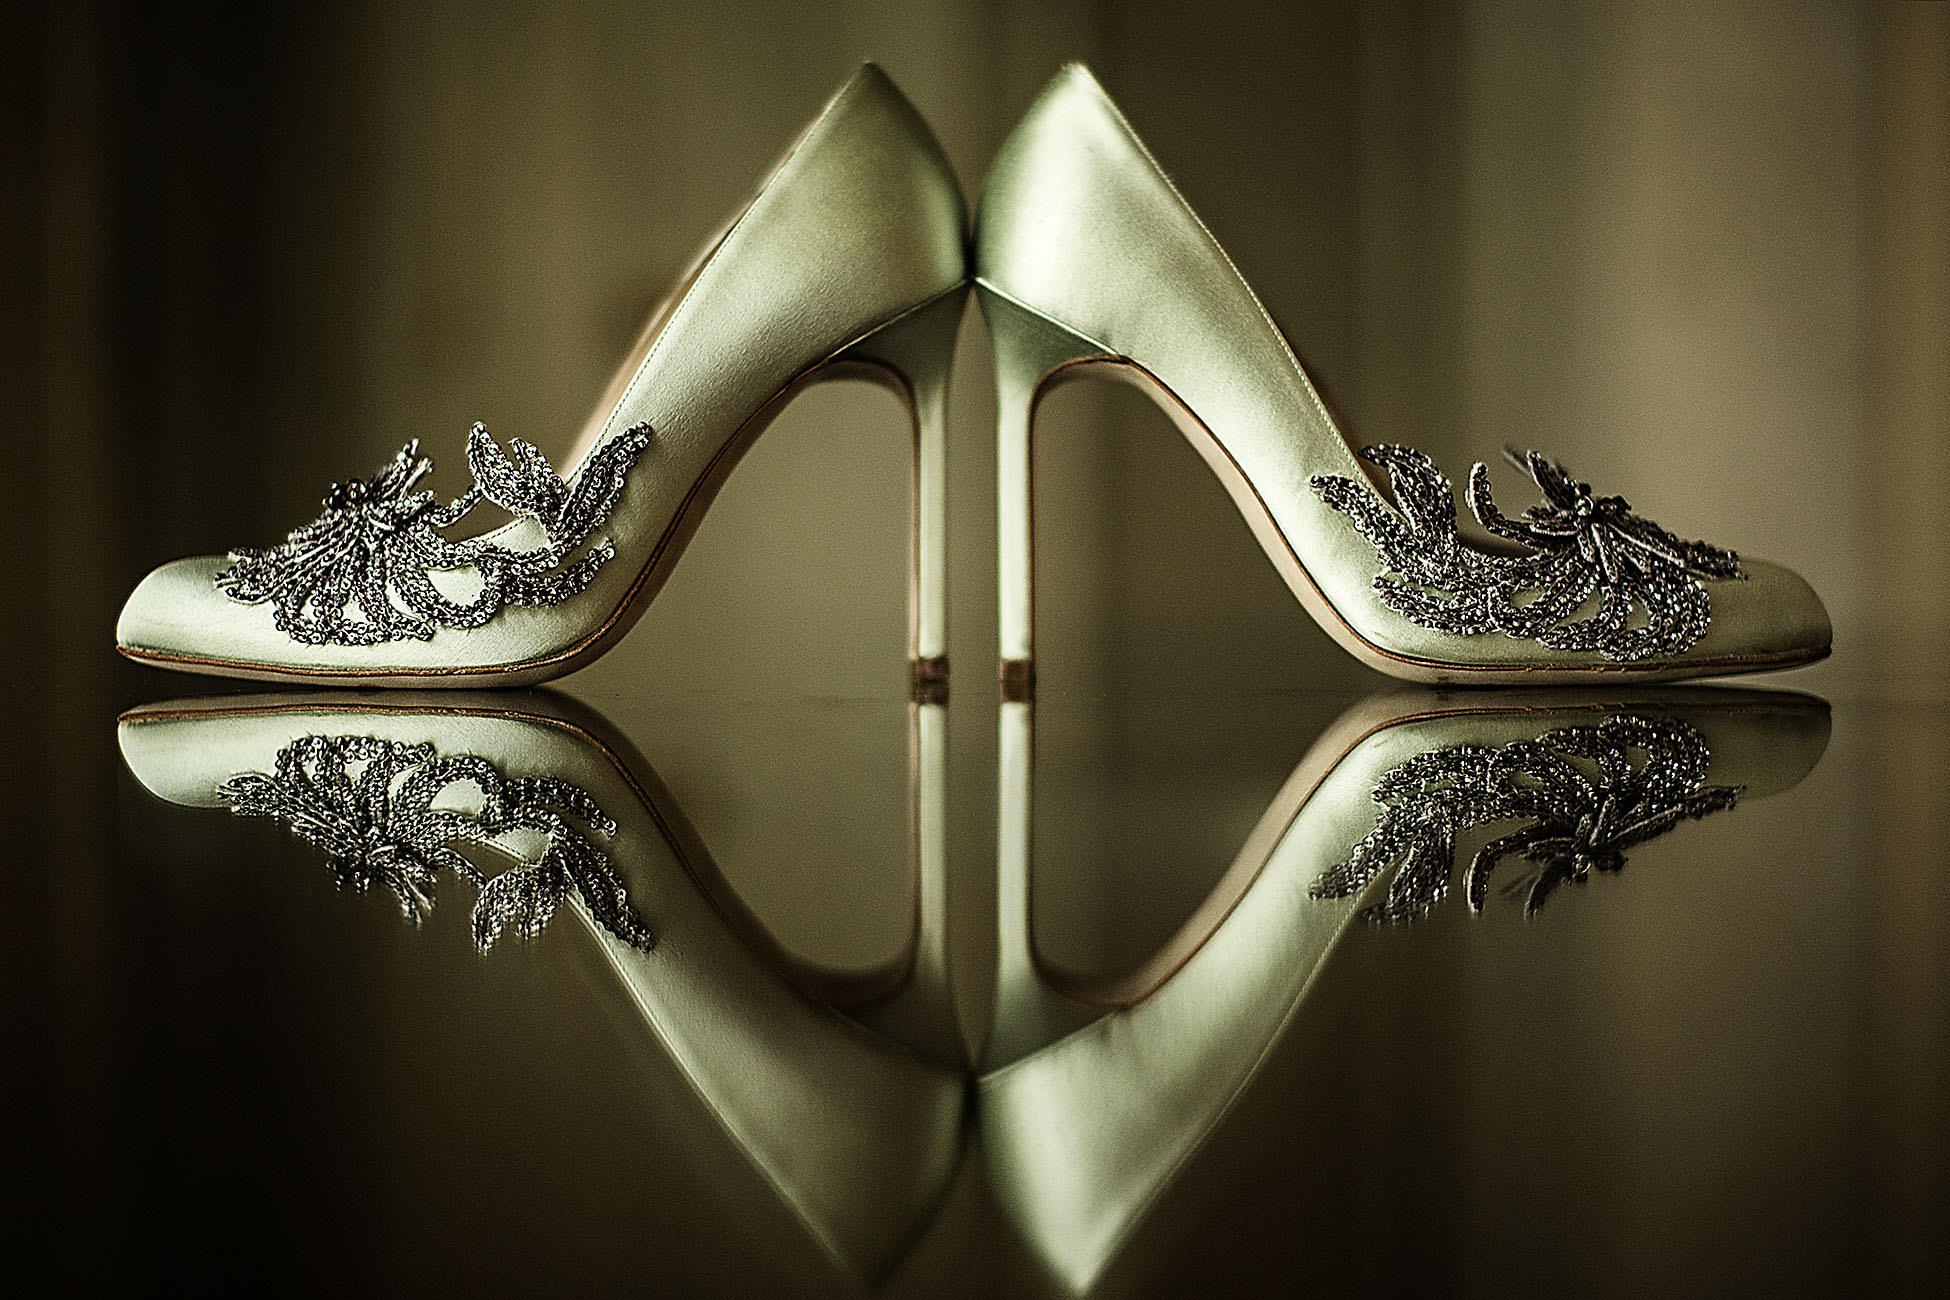 Fotografia di scarpe da sposa lussuose